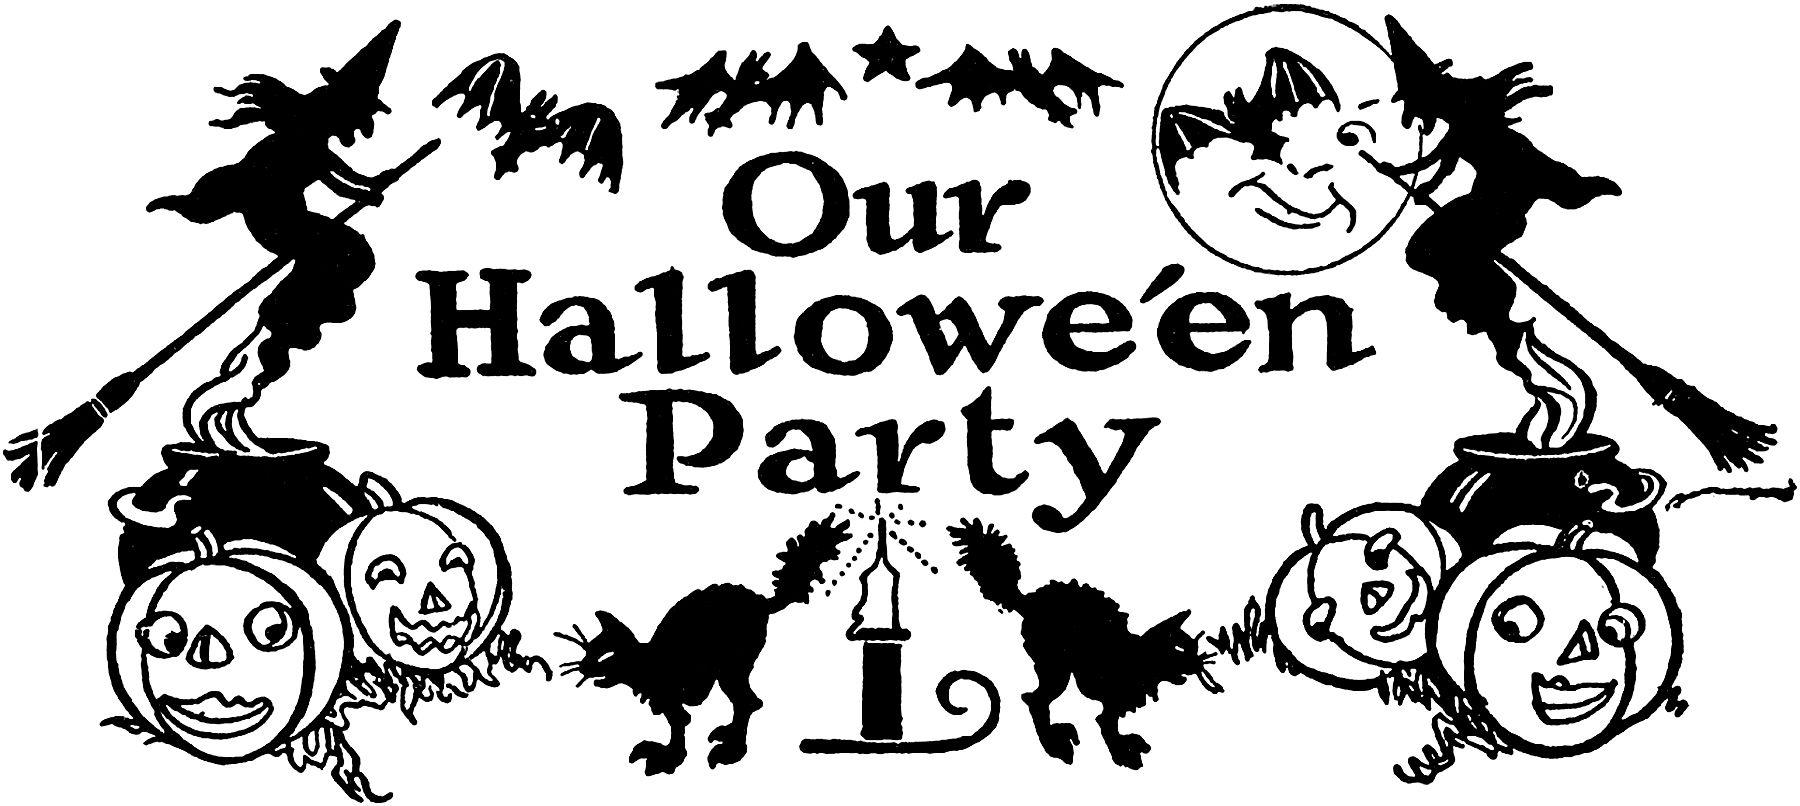 Vintage Halloween Graphicsfairy012 Jpg 1800 806 White